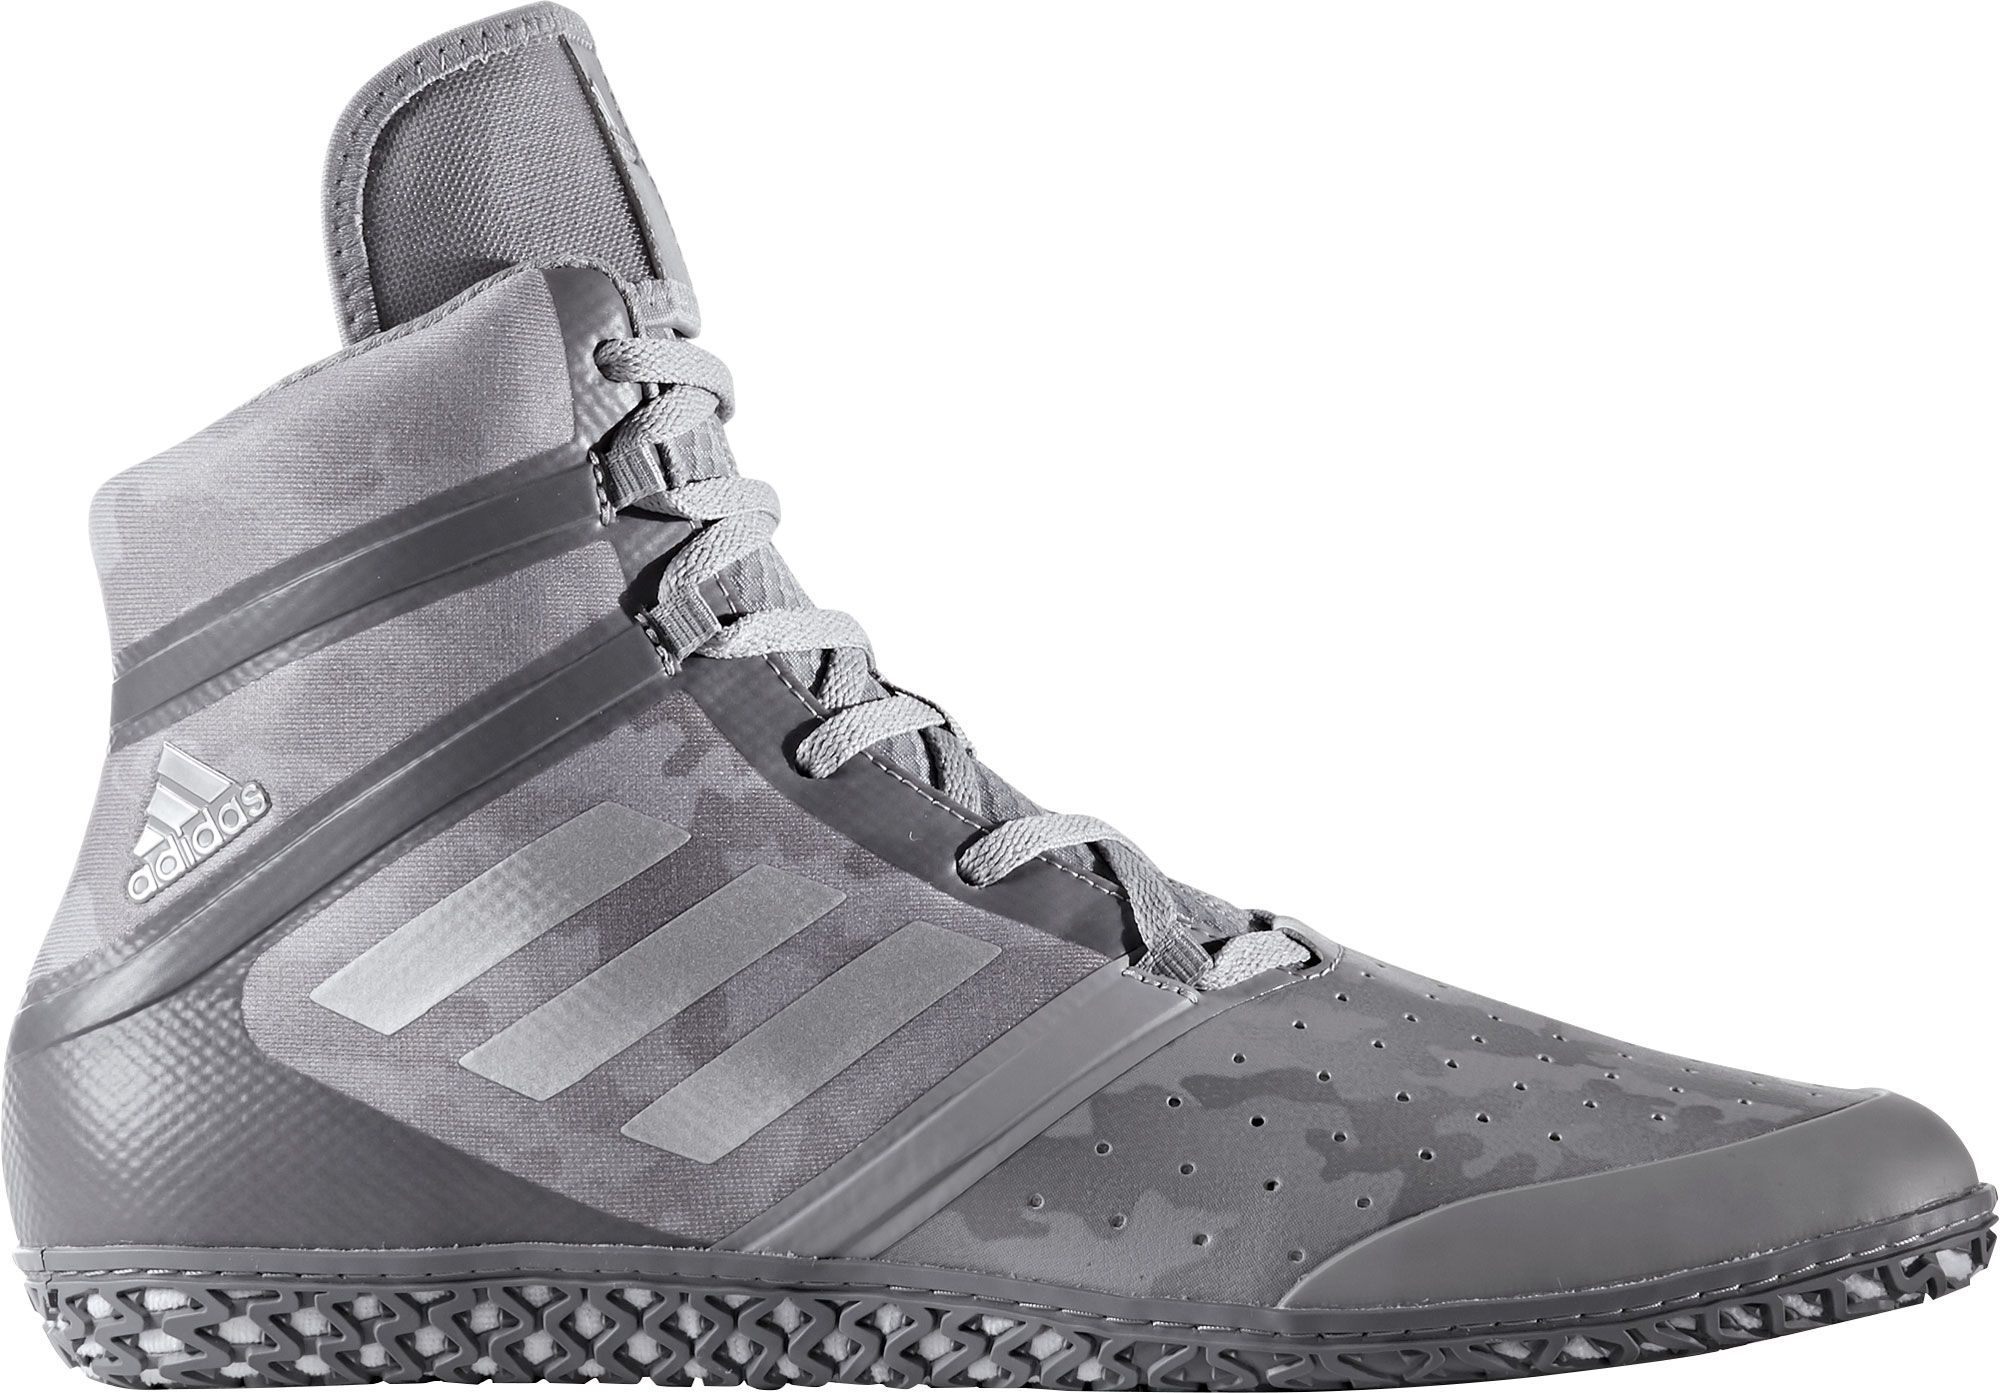 adidas Men's Impact Wrestling Shoes in 2020 | Wrestling